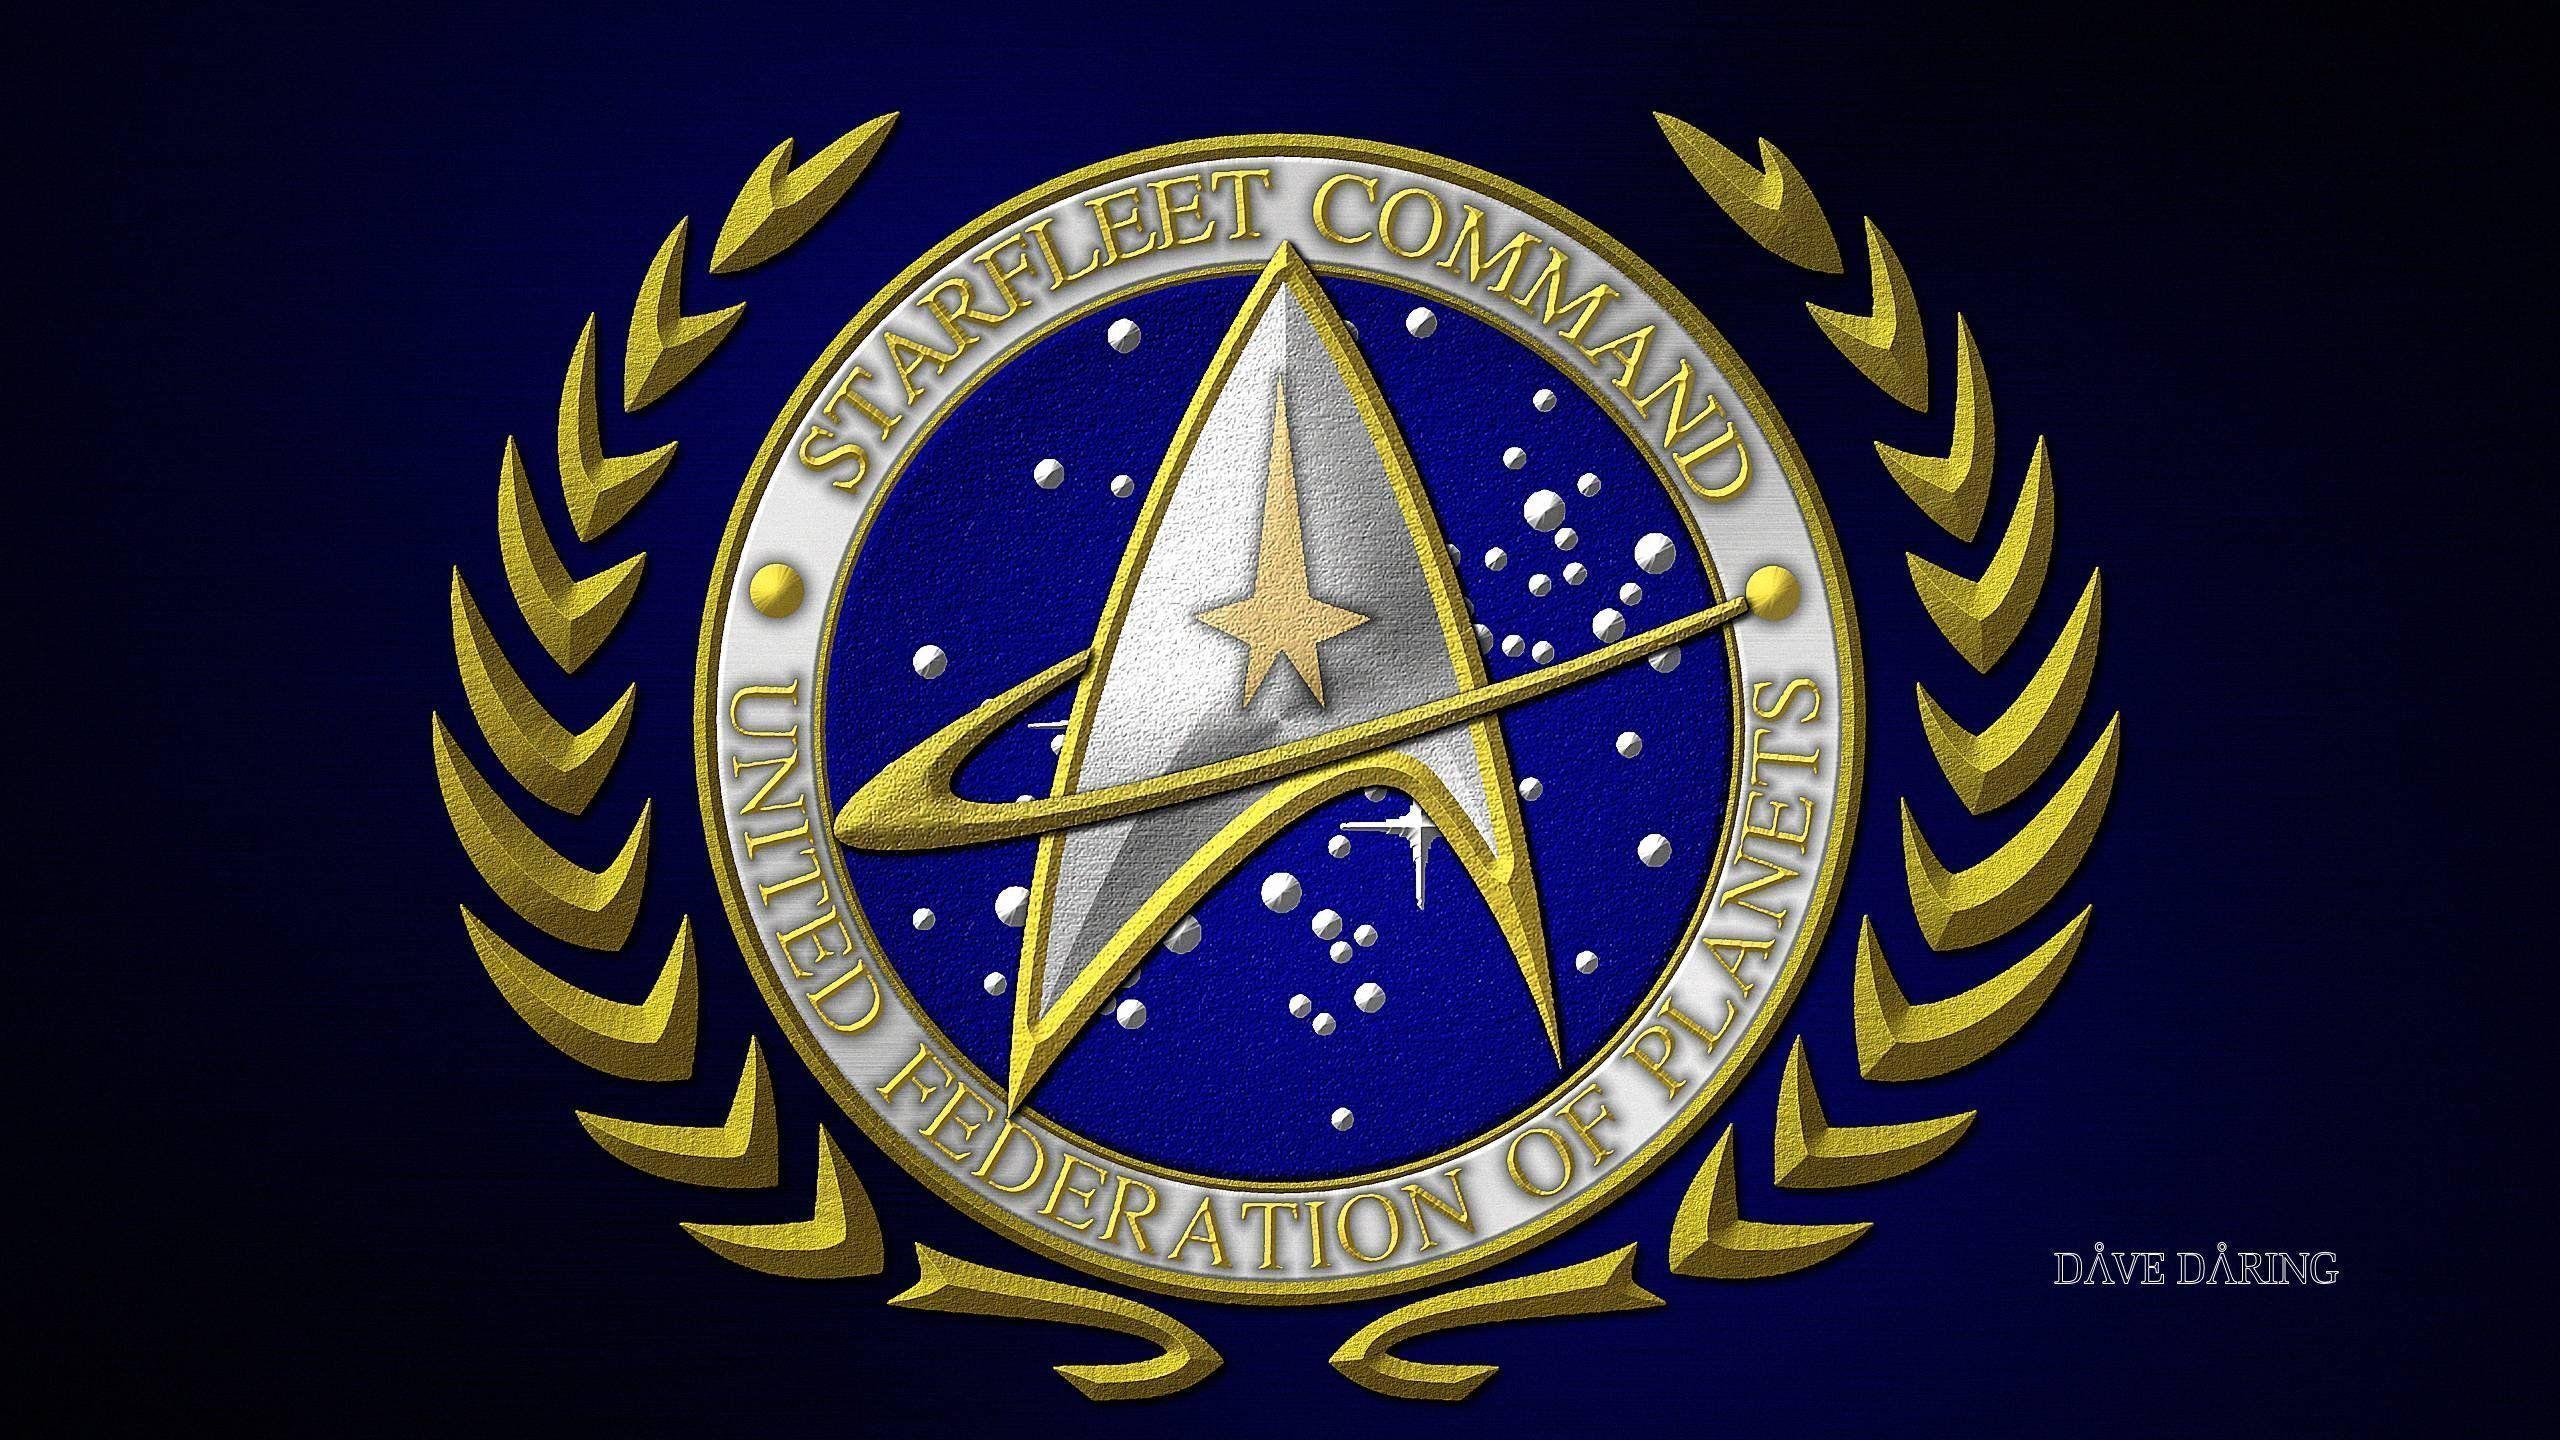 star trek starfleet command wallpaper - photo #6